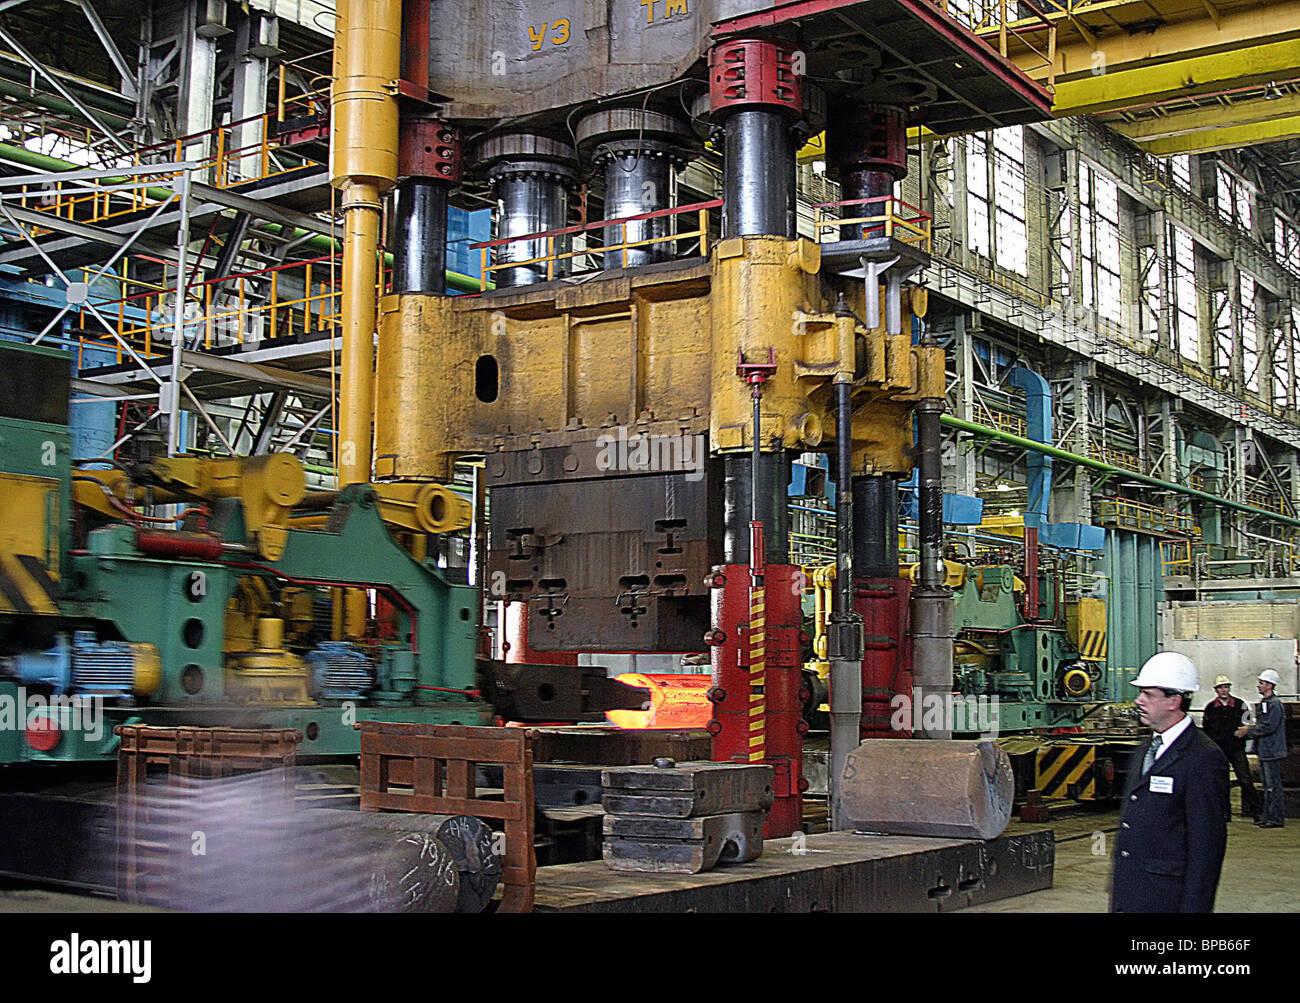 Verkhnesaldinsk Metallurgical Plant and Avisma Titanium Magnesium Plant have merged - Stock Image